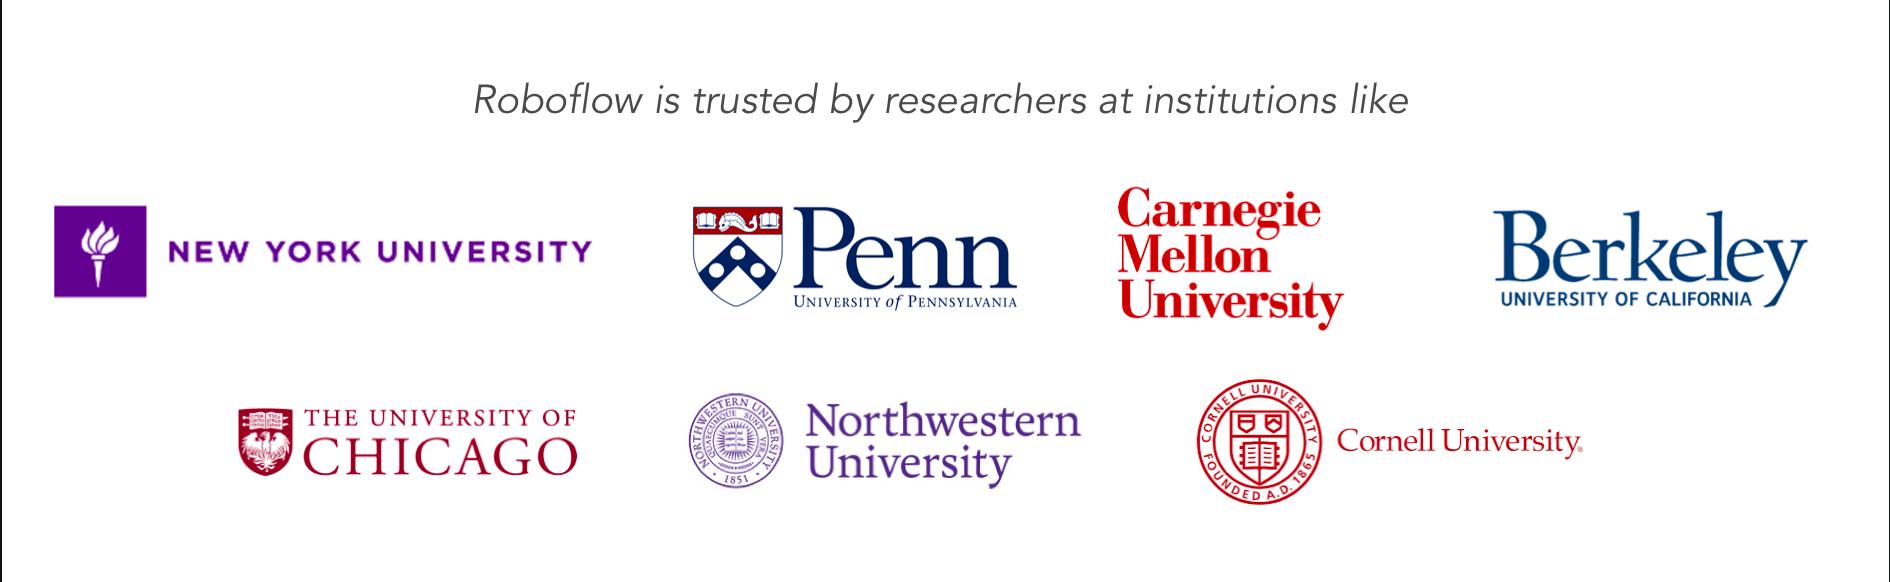 University Logos (NYU, UPenn, Carnegie Mellon, Berkeley, UChicago, Northwestern, Cornell)